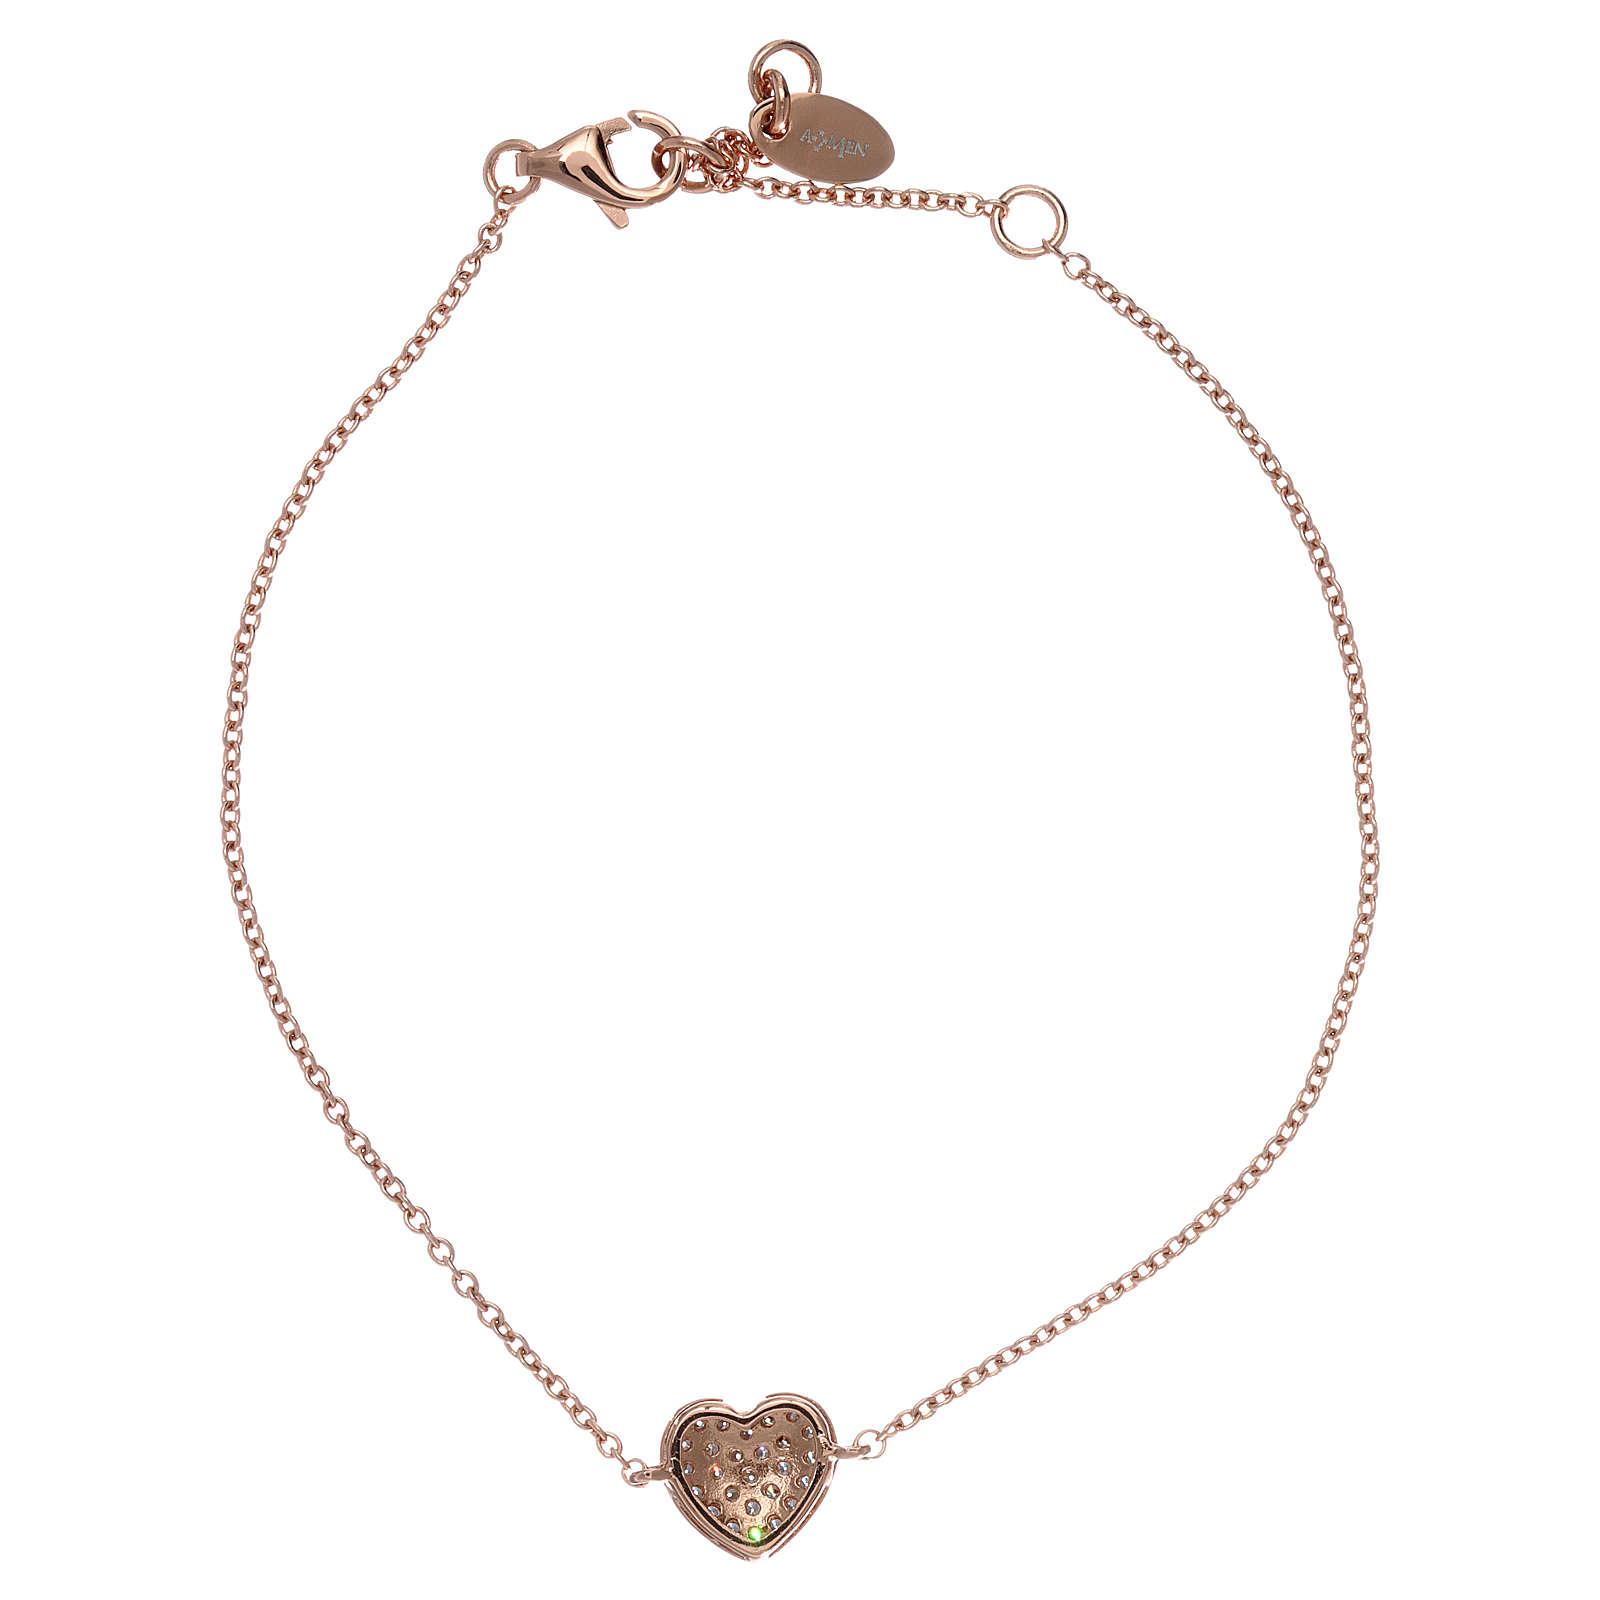 Bracciale AMEN argento 925 rosé charm cuore con zirconi bianchi 4